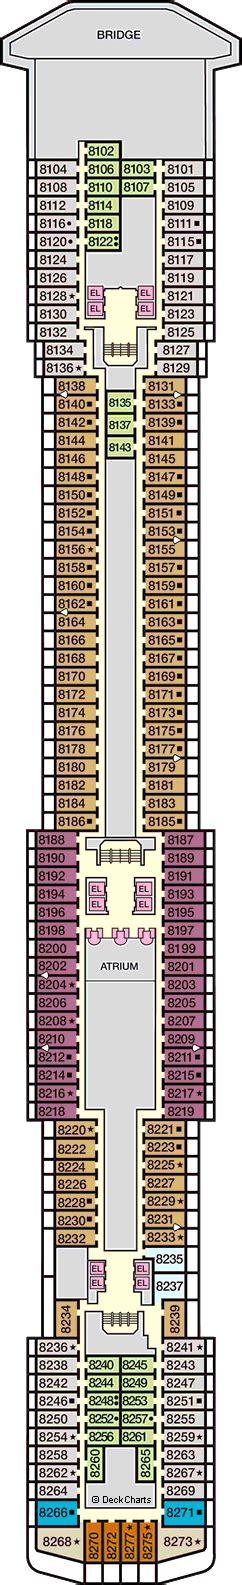 carnival legend floor plan carnival legend deck 8 panorama deck cruise critic